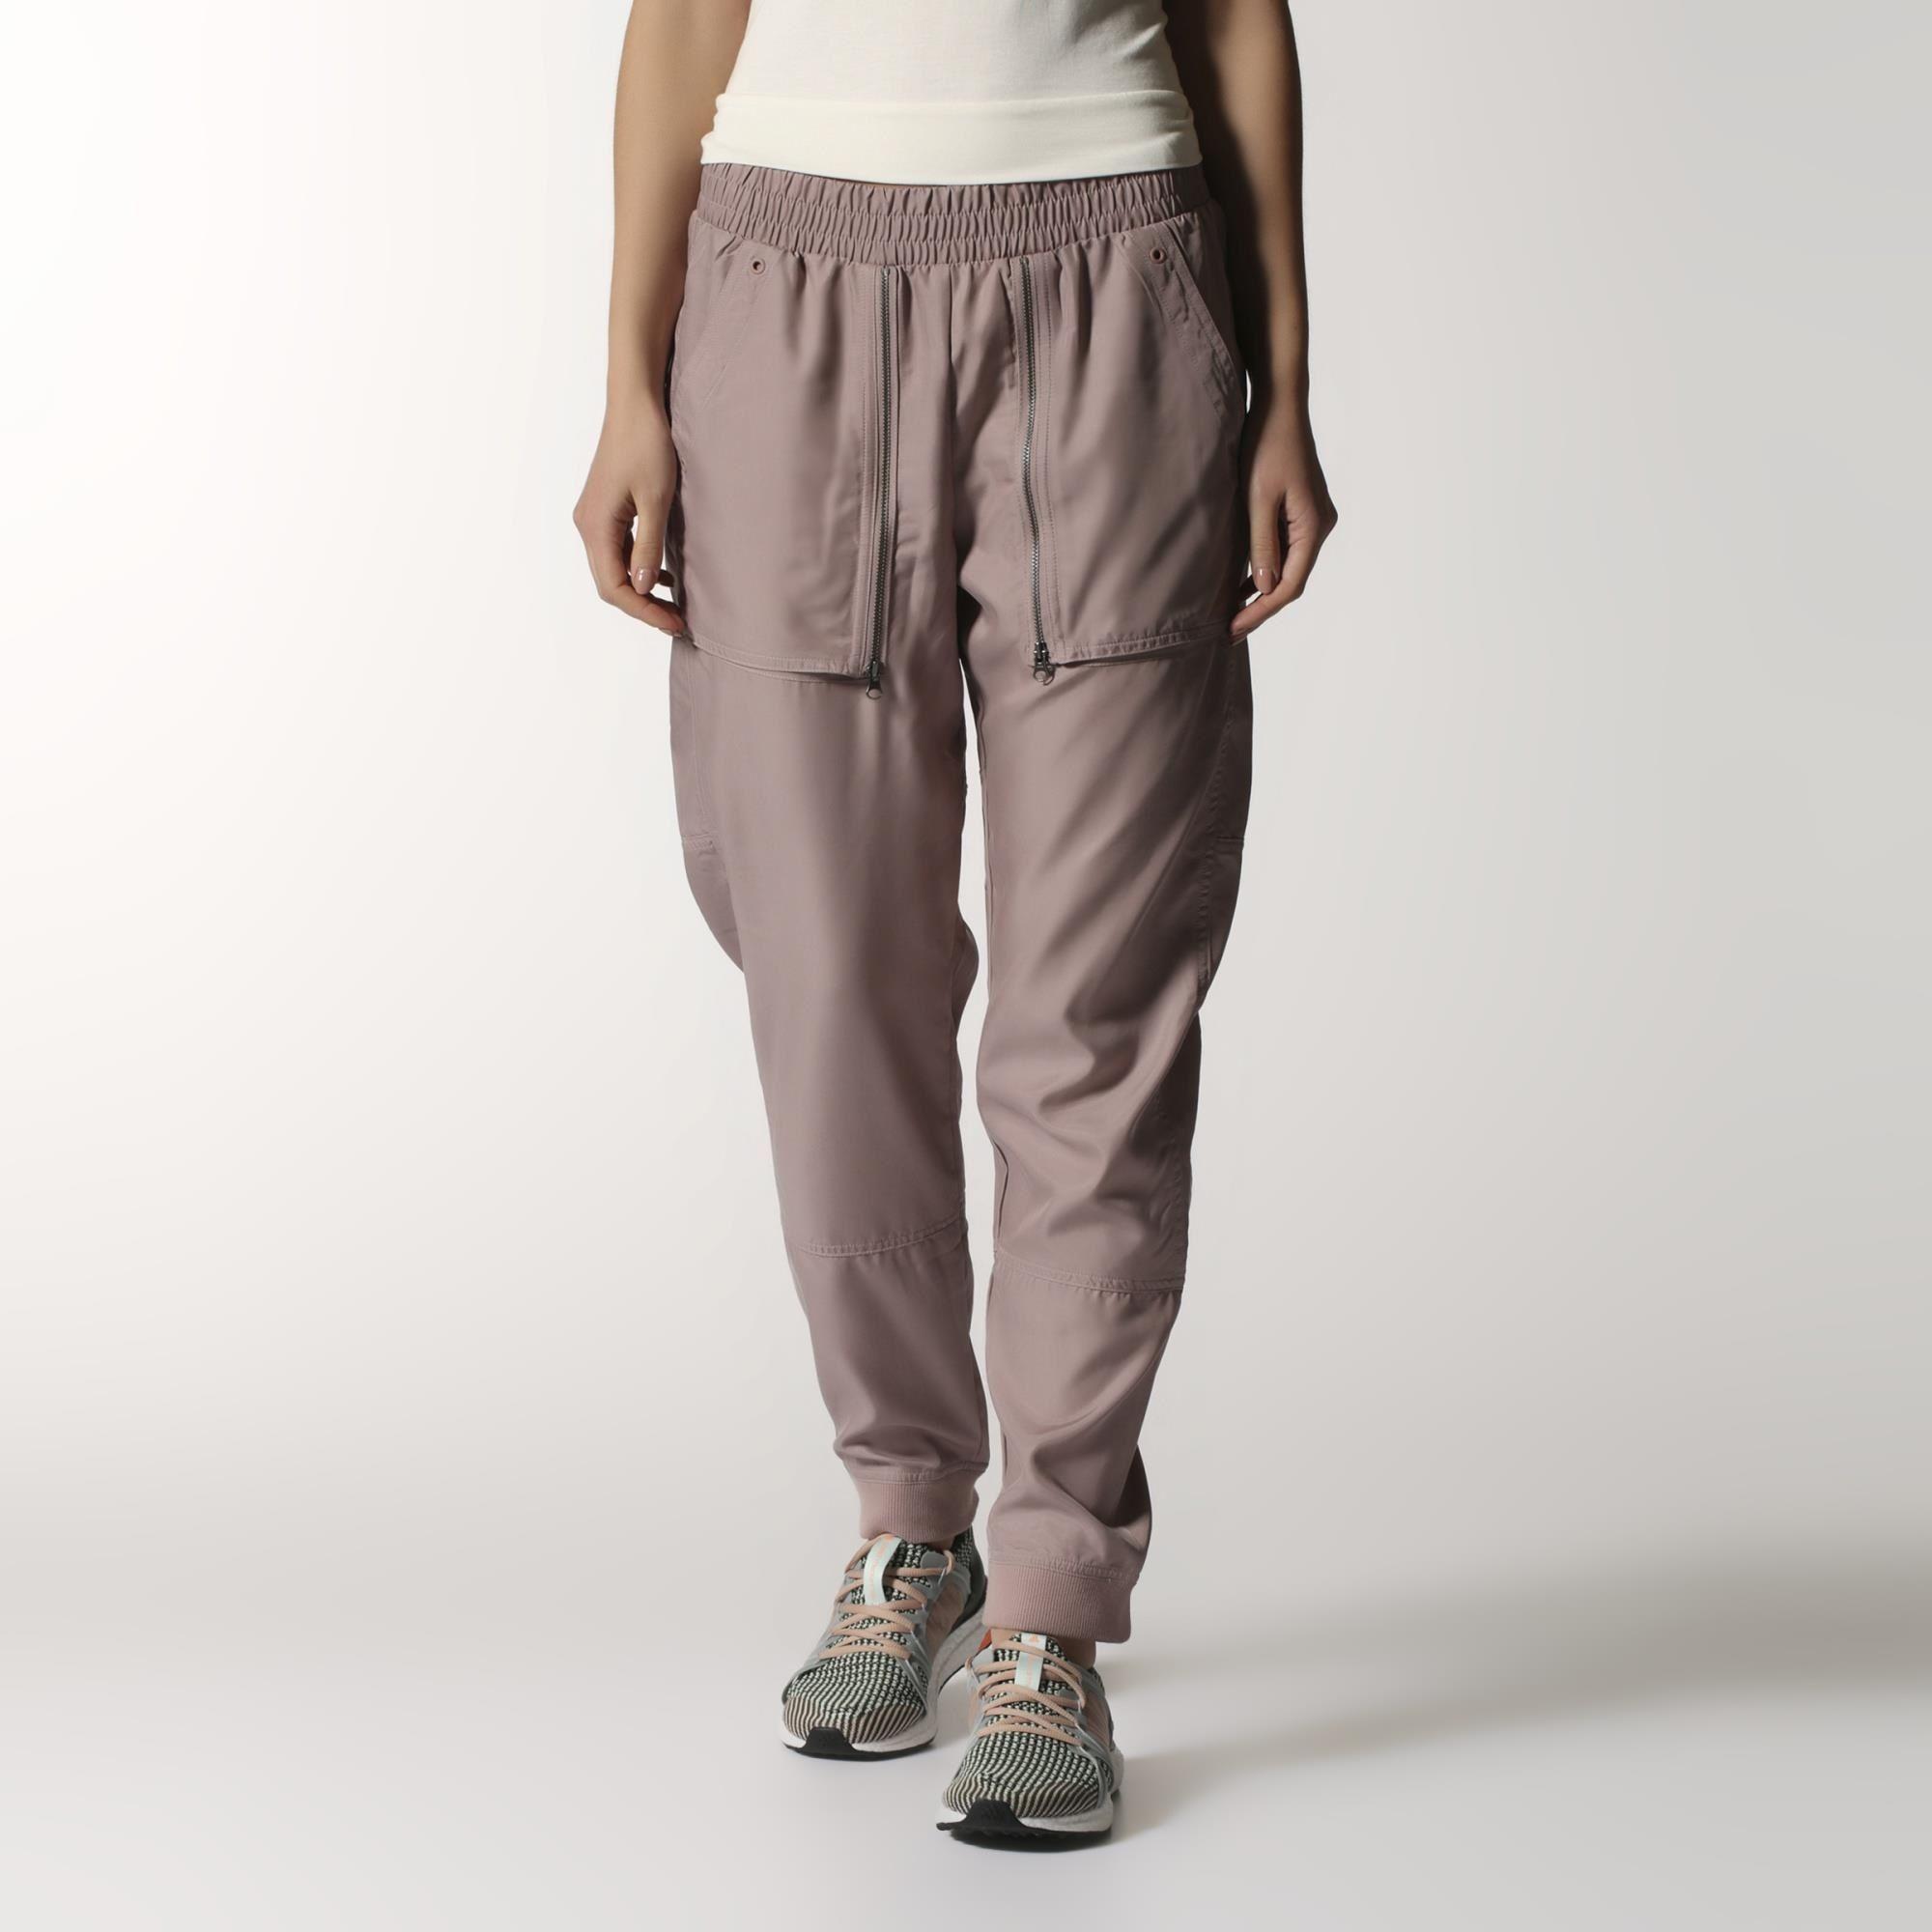 17c5a9500bc67 Pantalón de Buzo Essentials Stella McCartney - Pink adidas